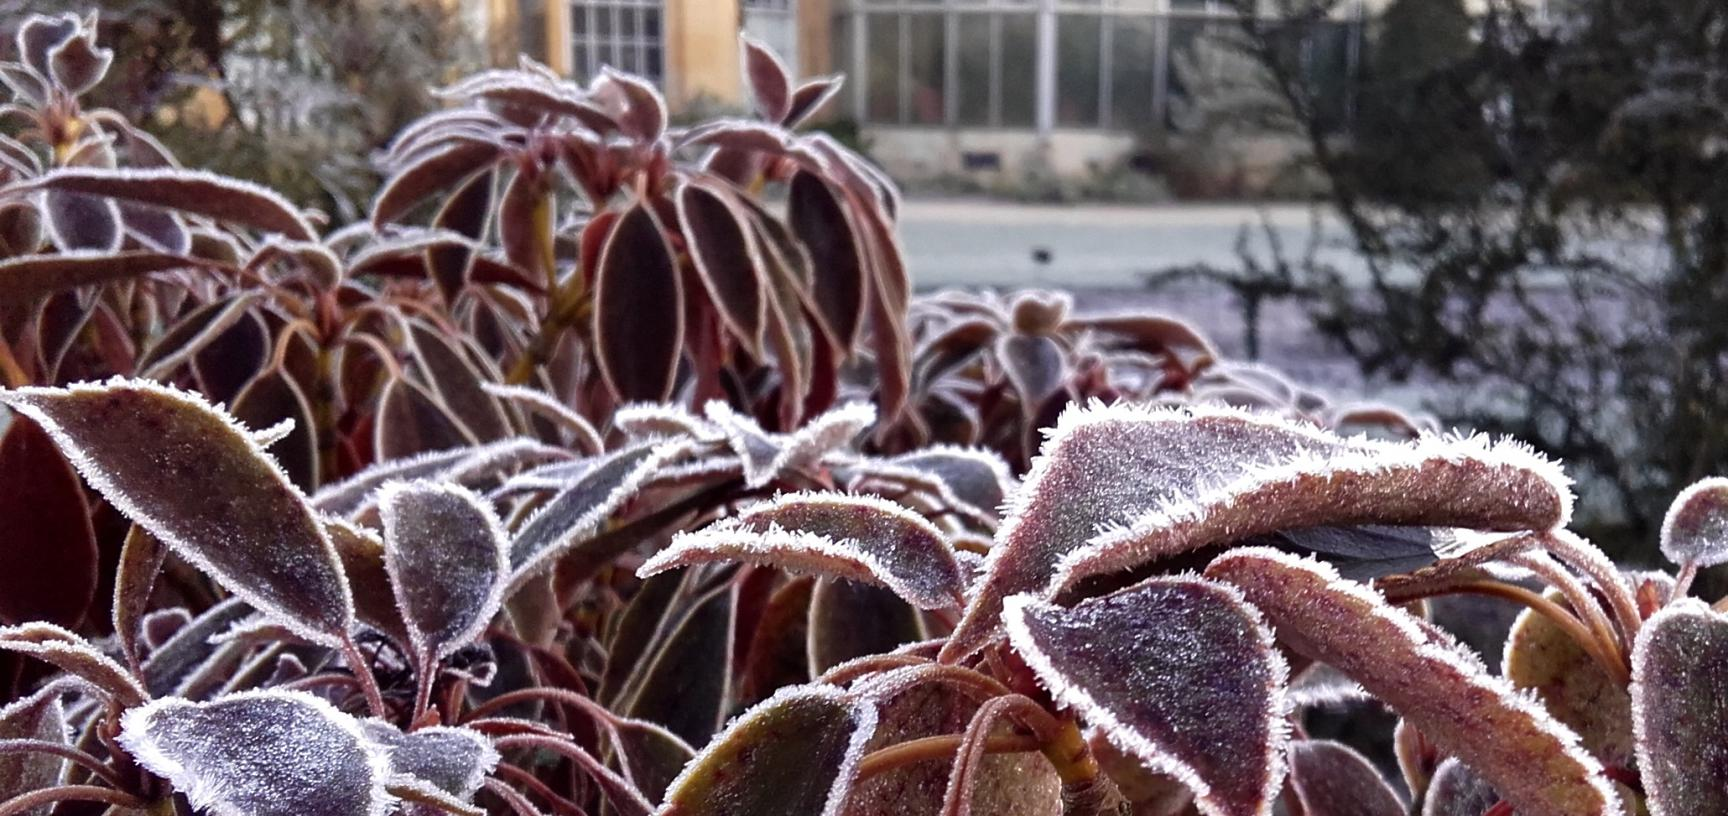 The Walled Garden in Winter